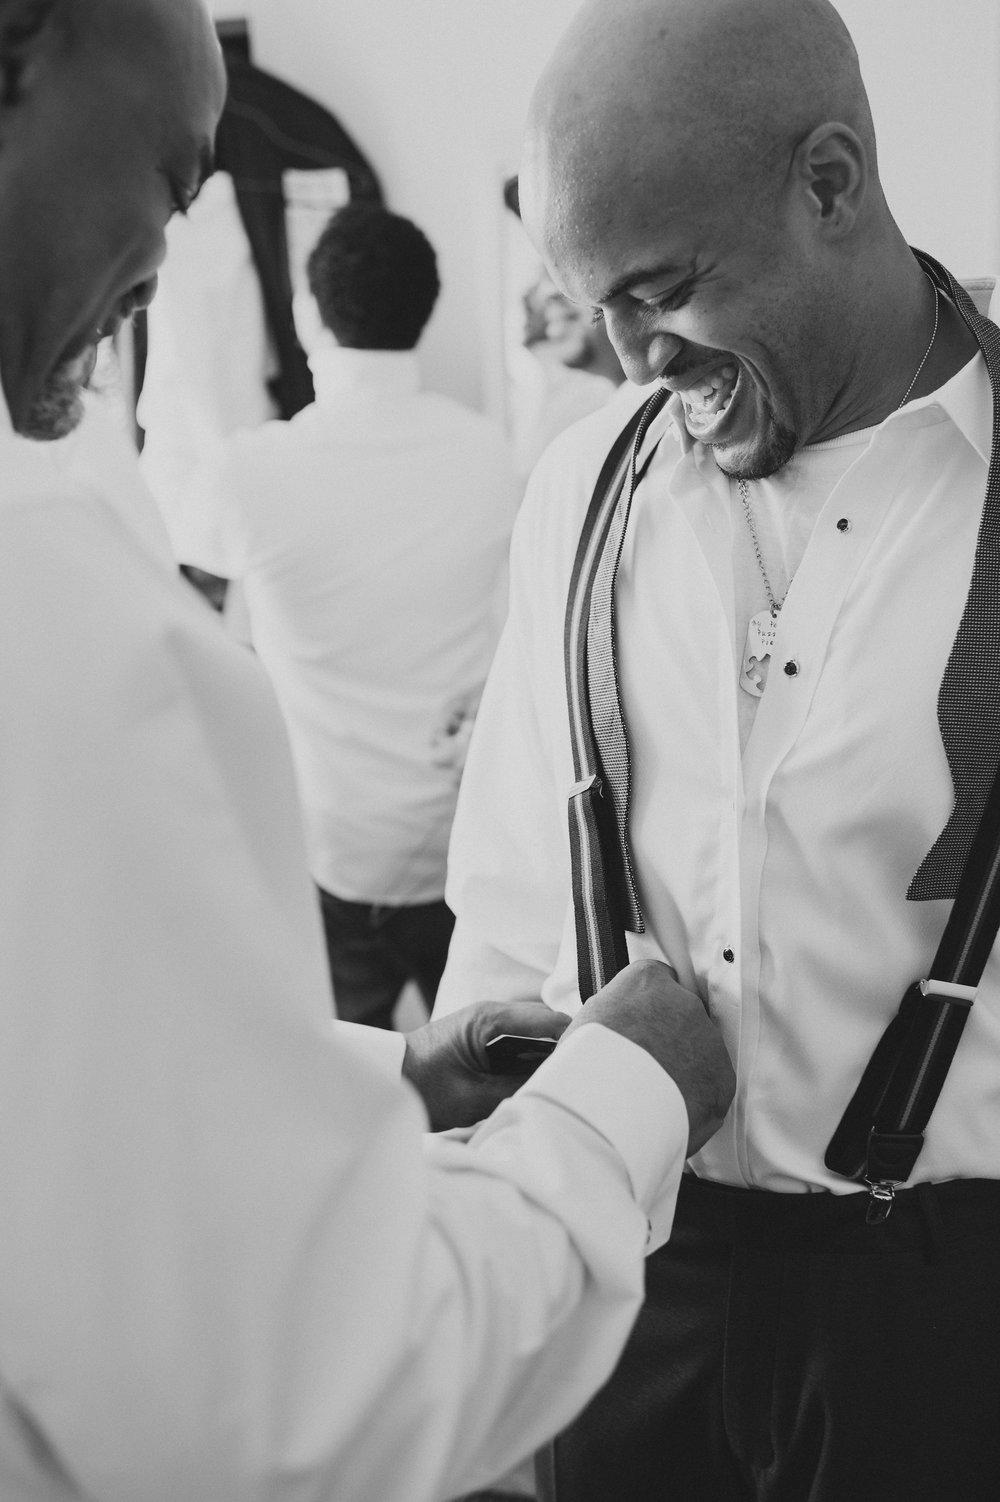 daniel&jackie|prewedding-176.jpg